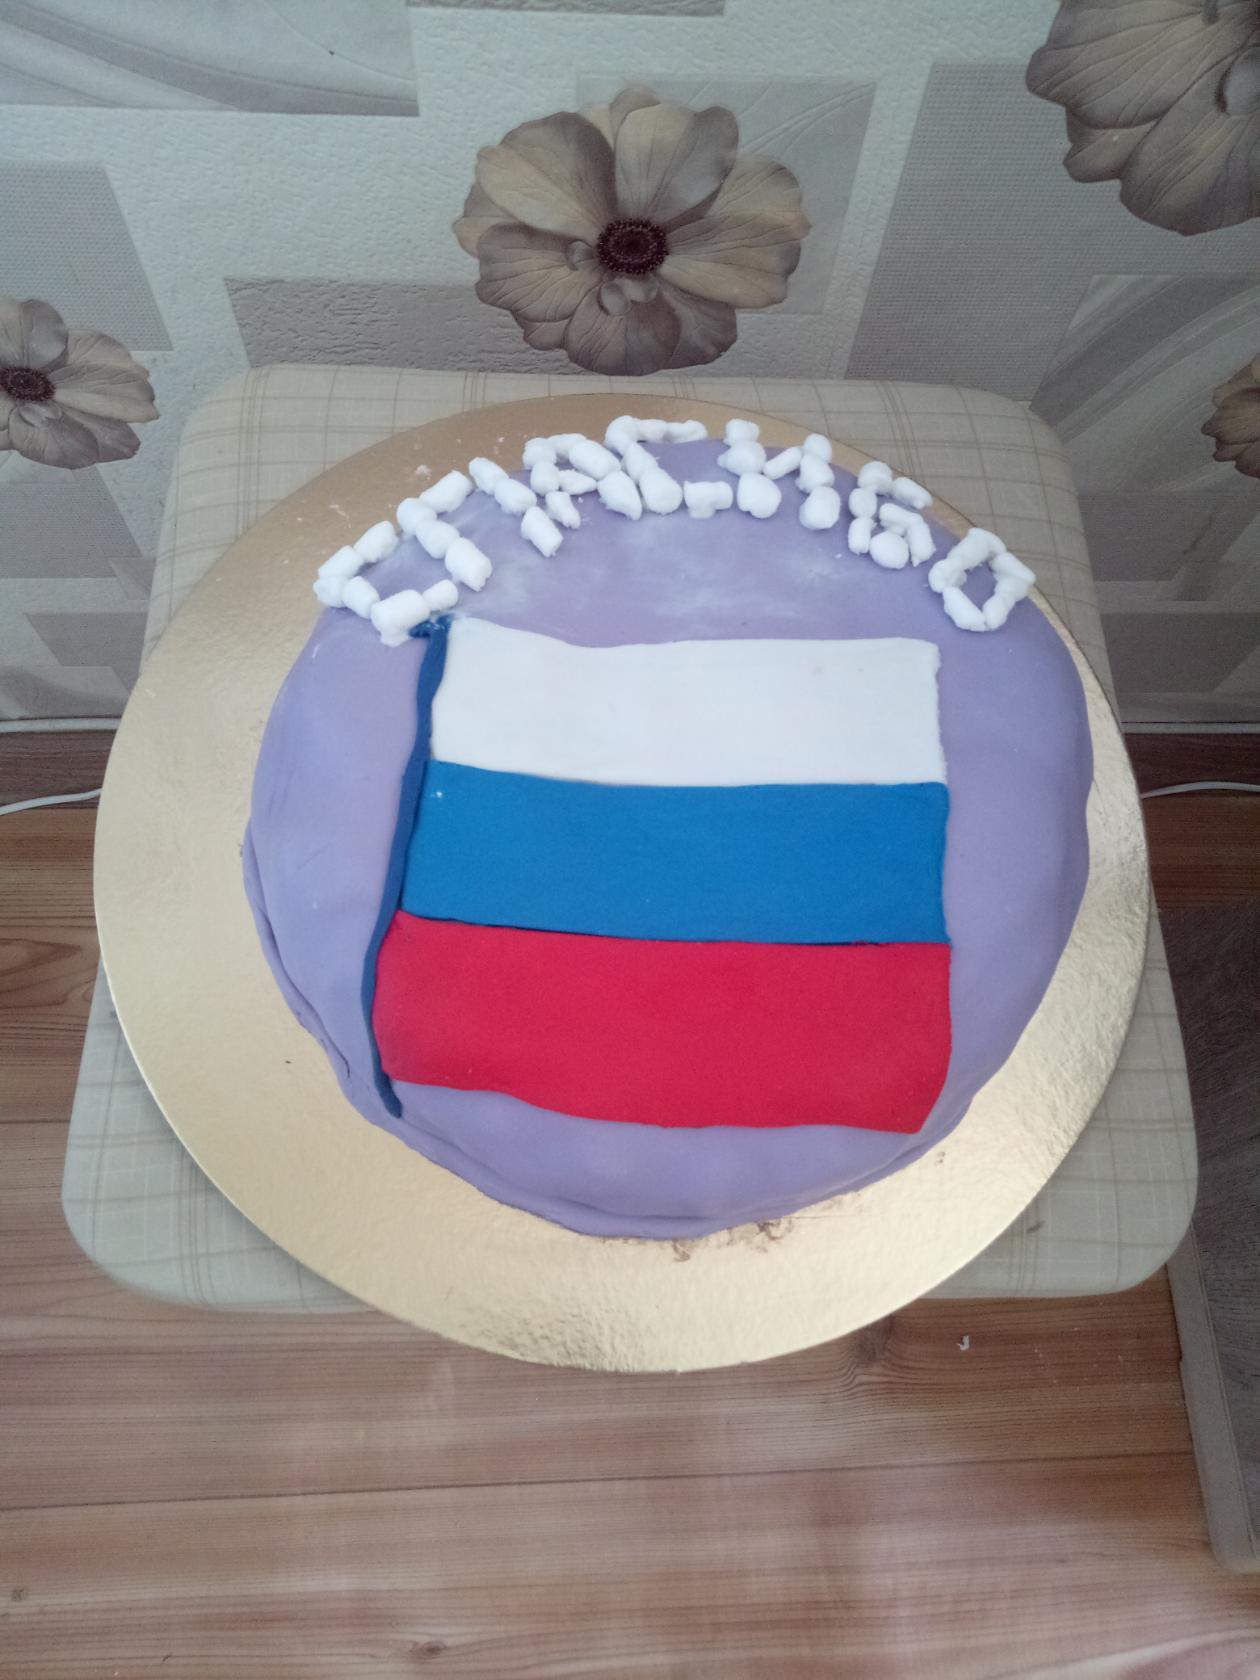 Акция «Испеки пирог и скажи спасибо» ко Дню России